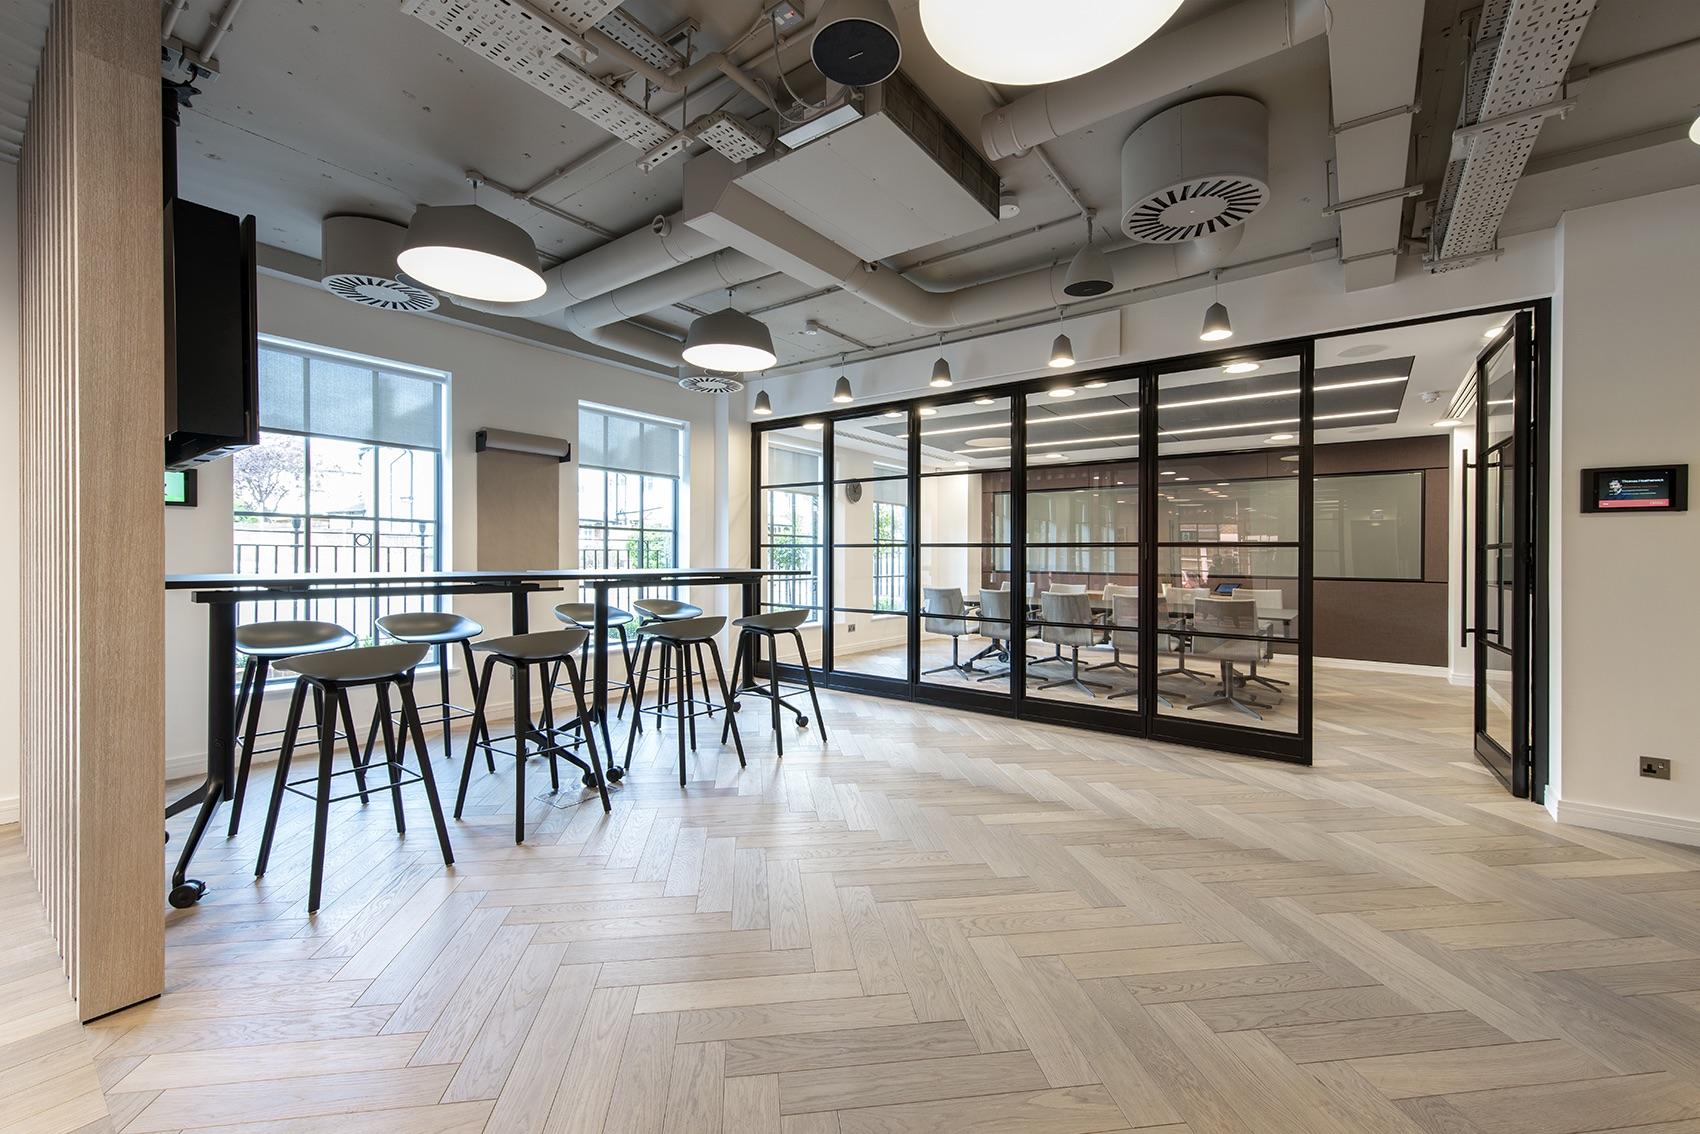 peldon-rose-new-office-london-17